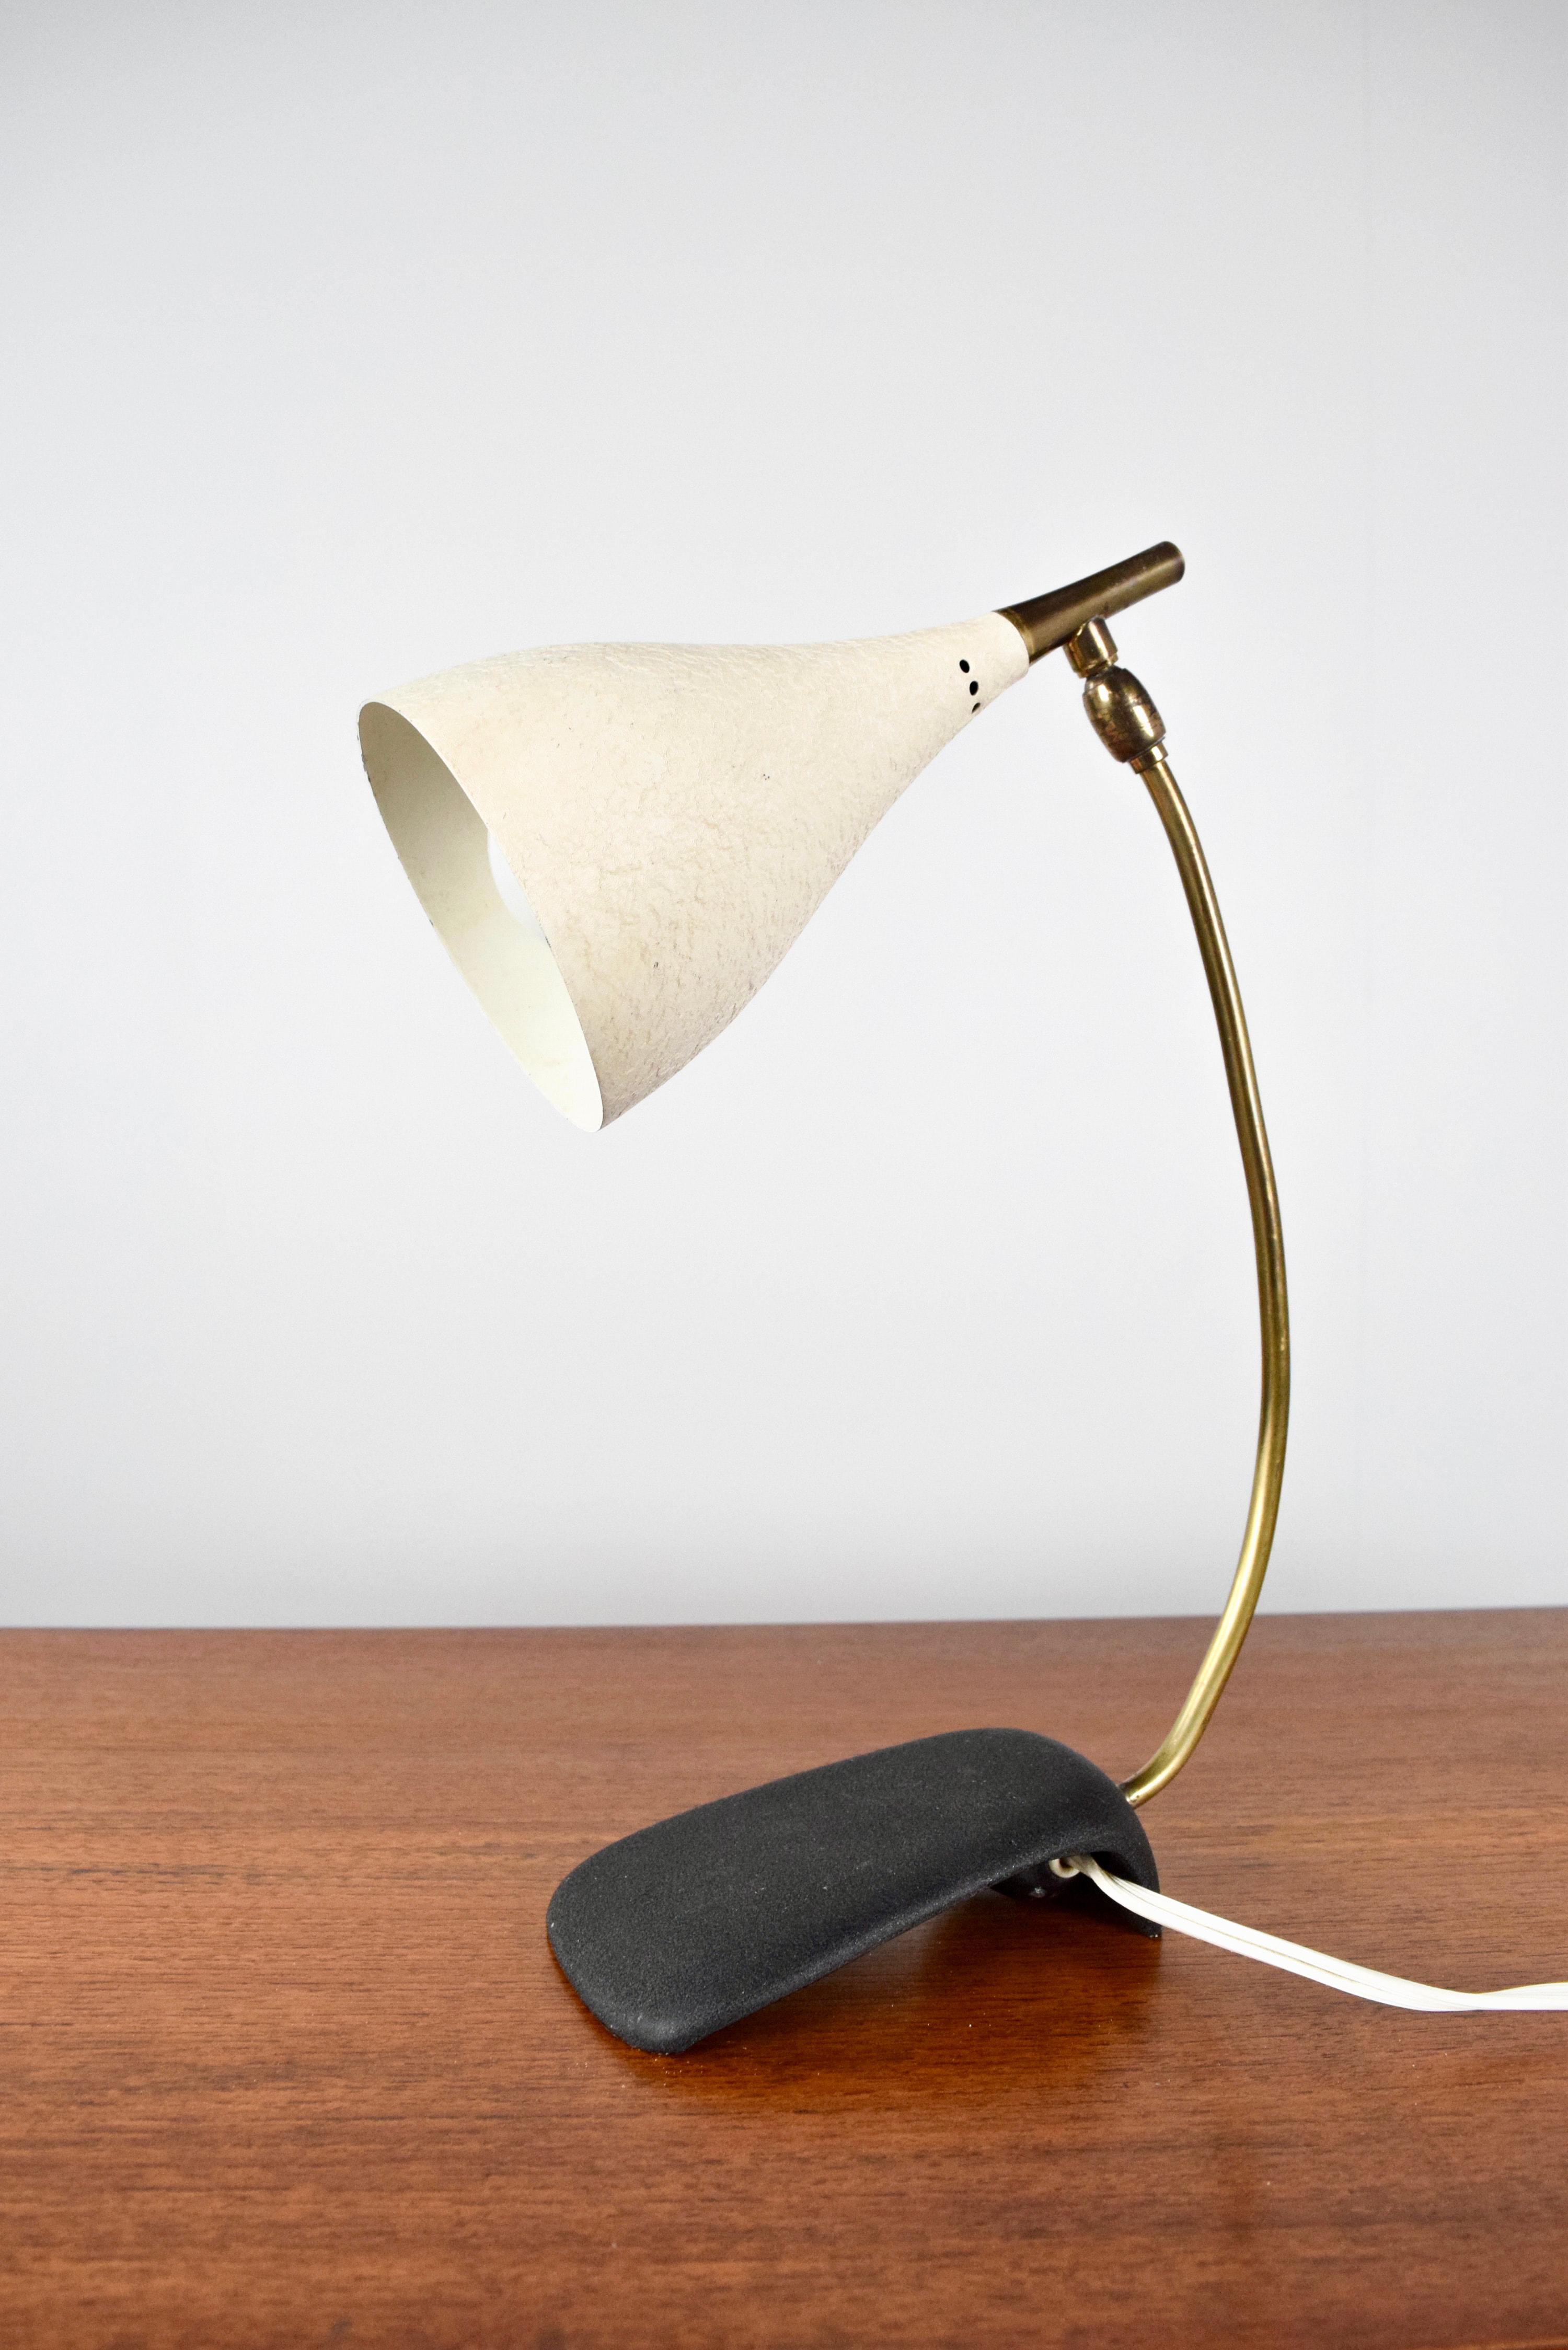 Minimalist Desk Lamp by Gebrüder Cosack, Germany 1950's